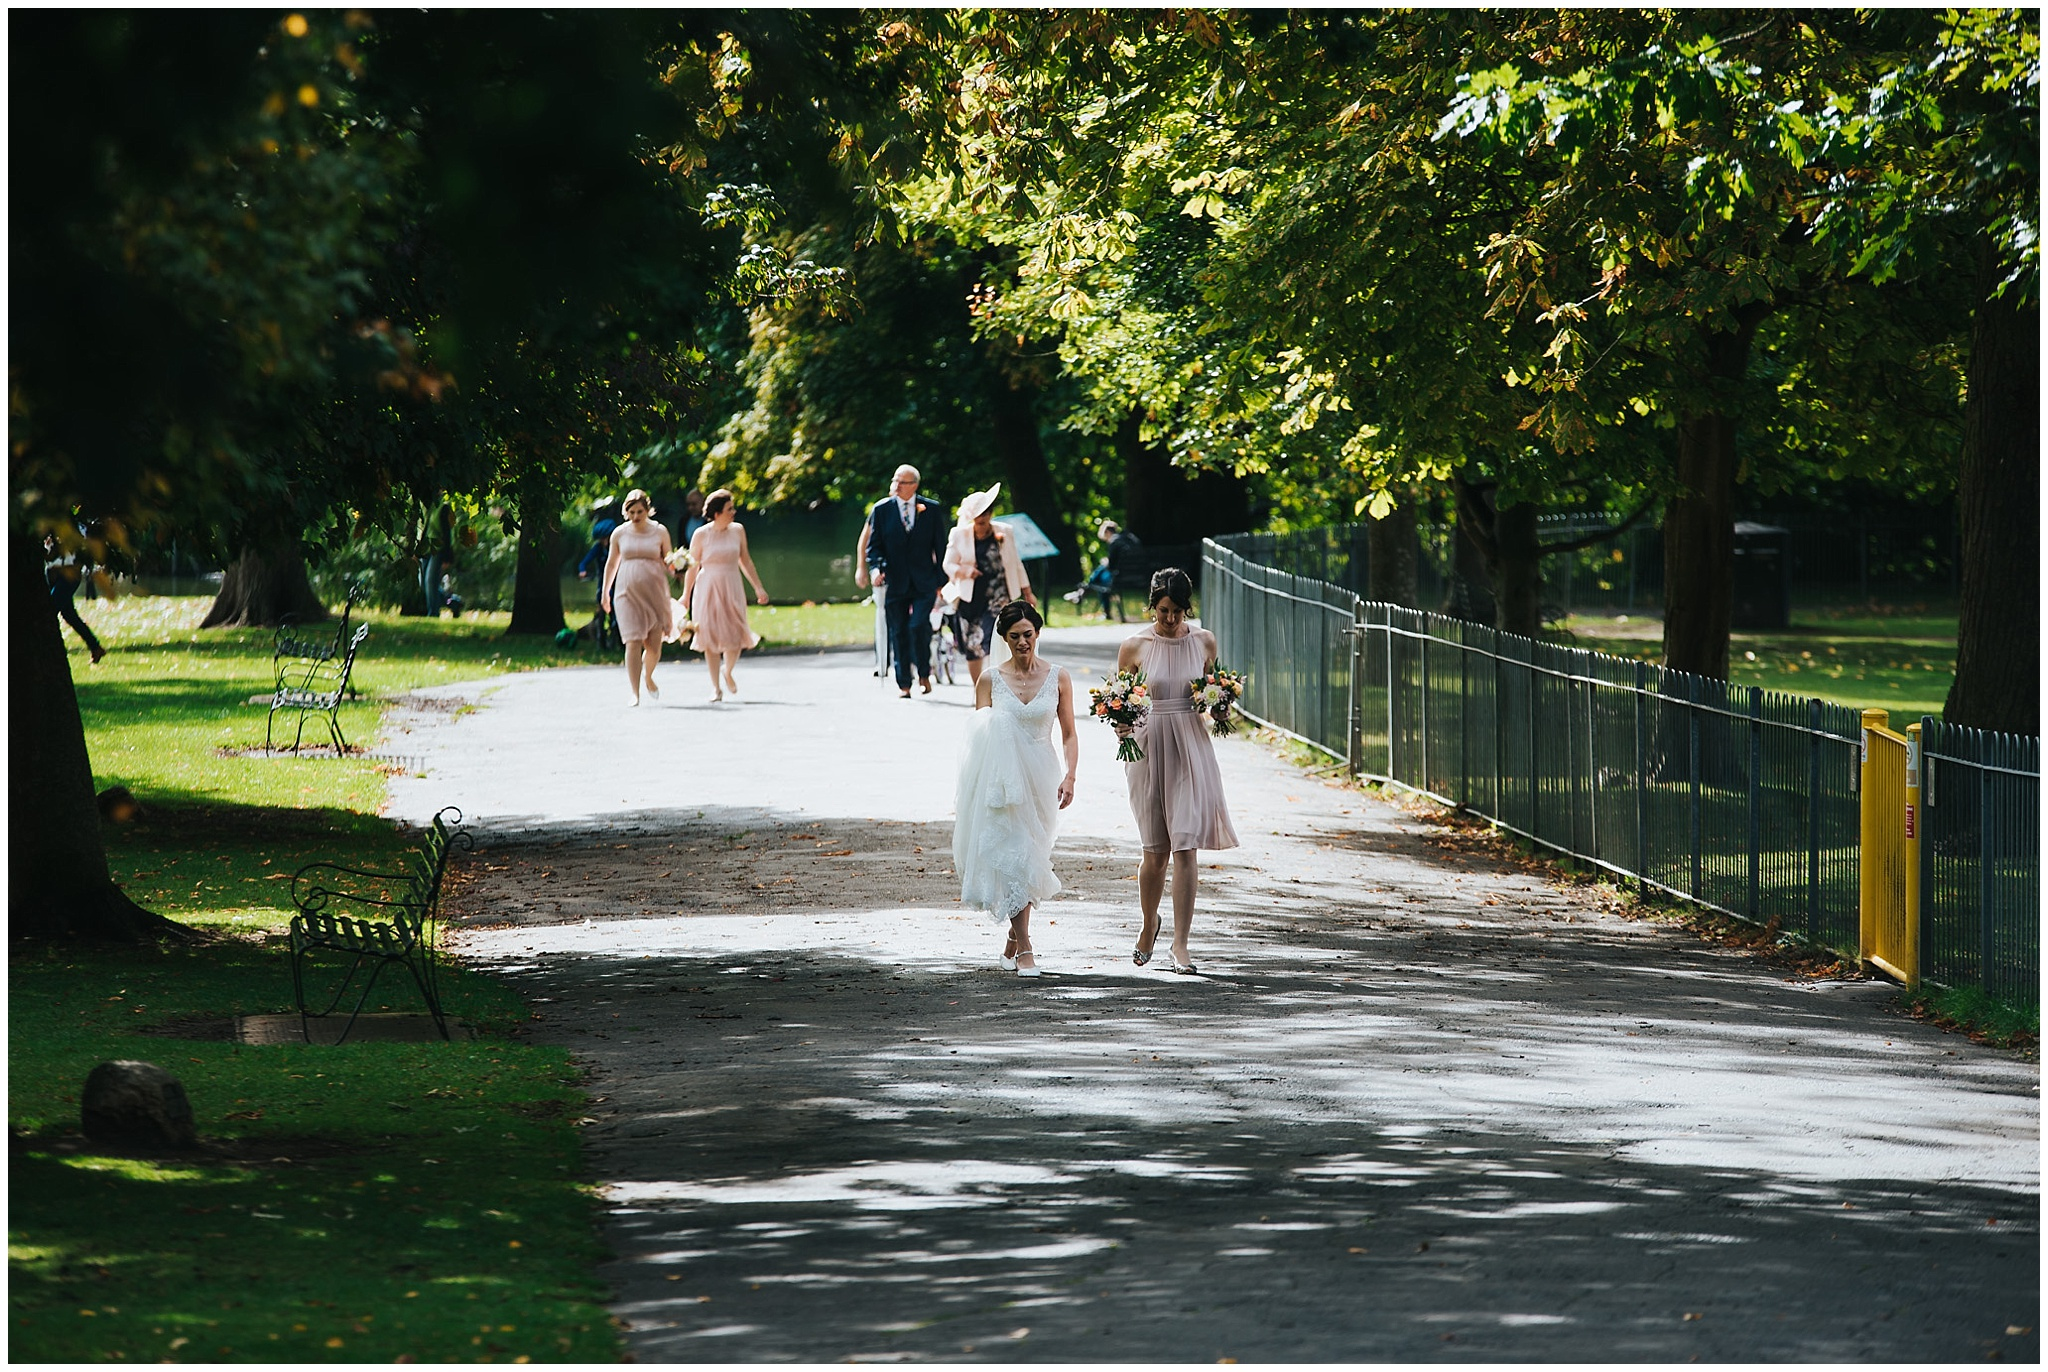 Stanway House Gloucester wedding photography026